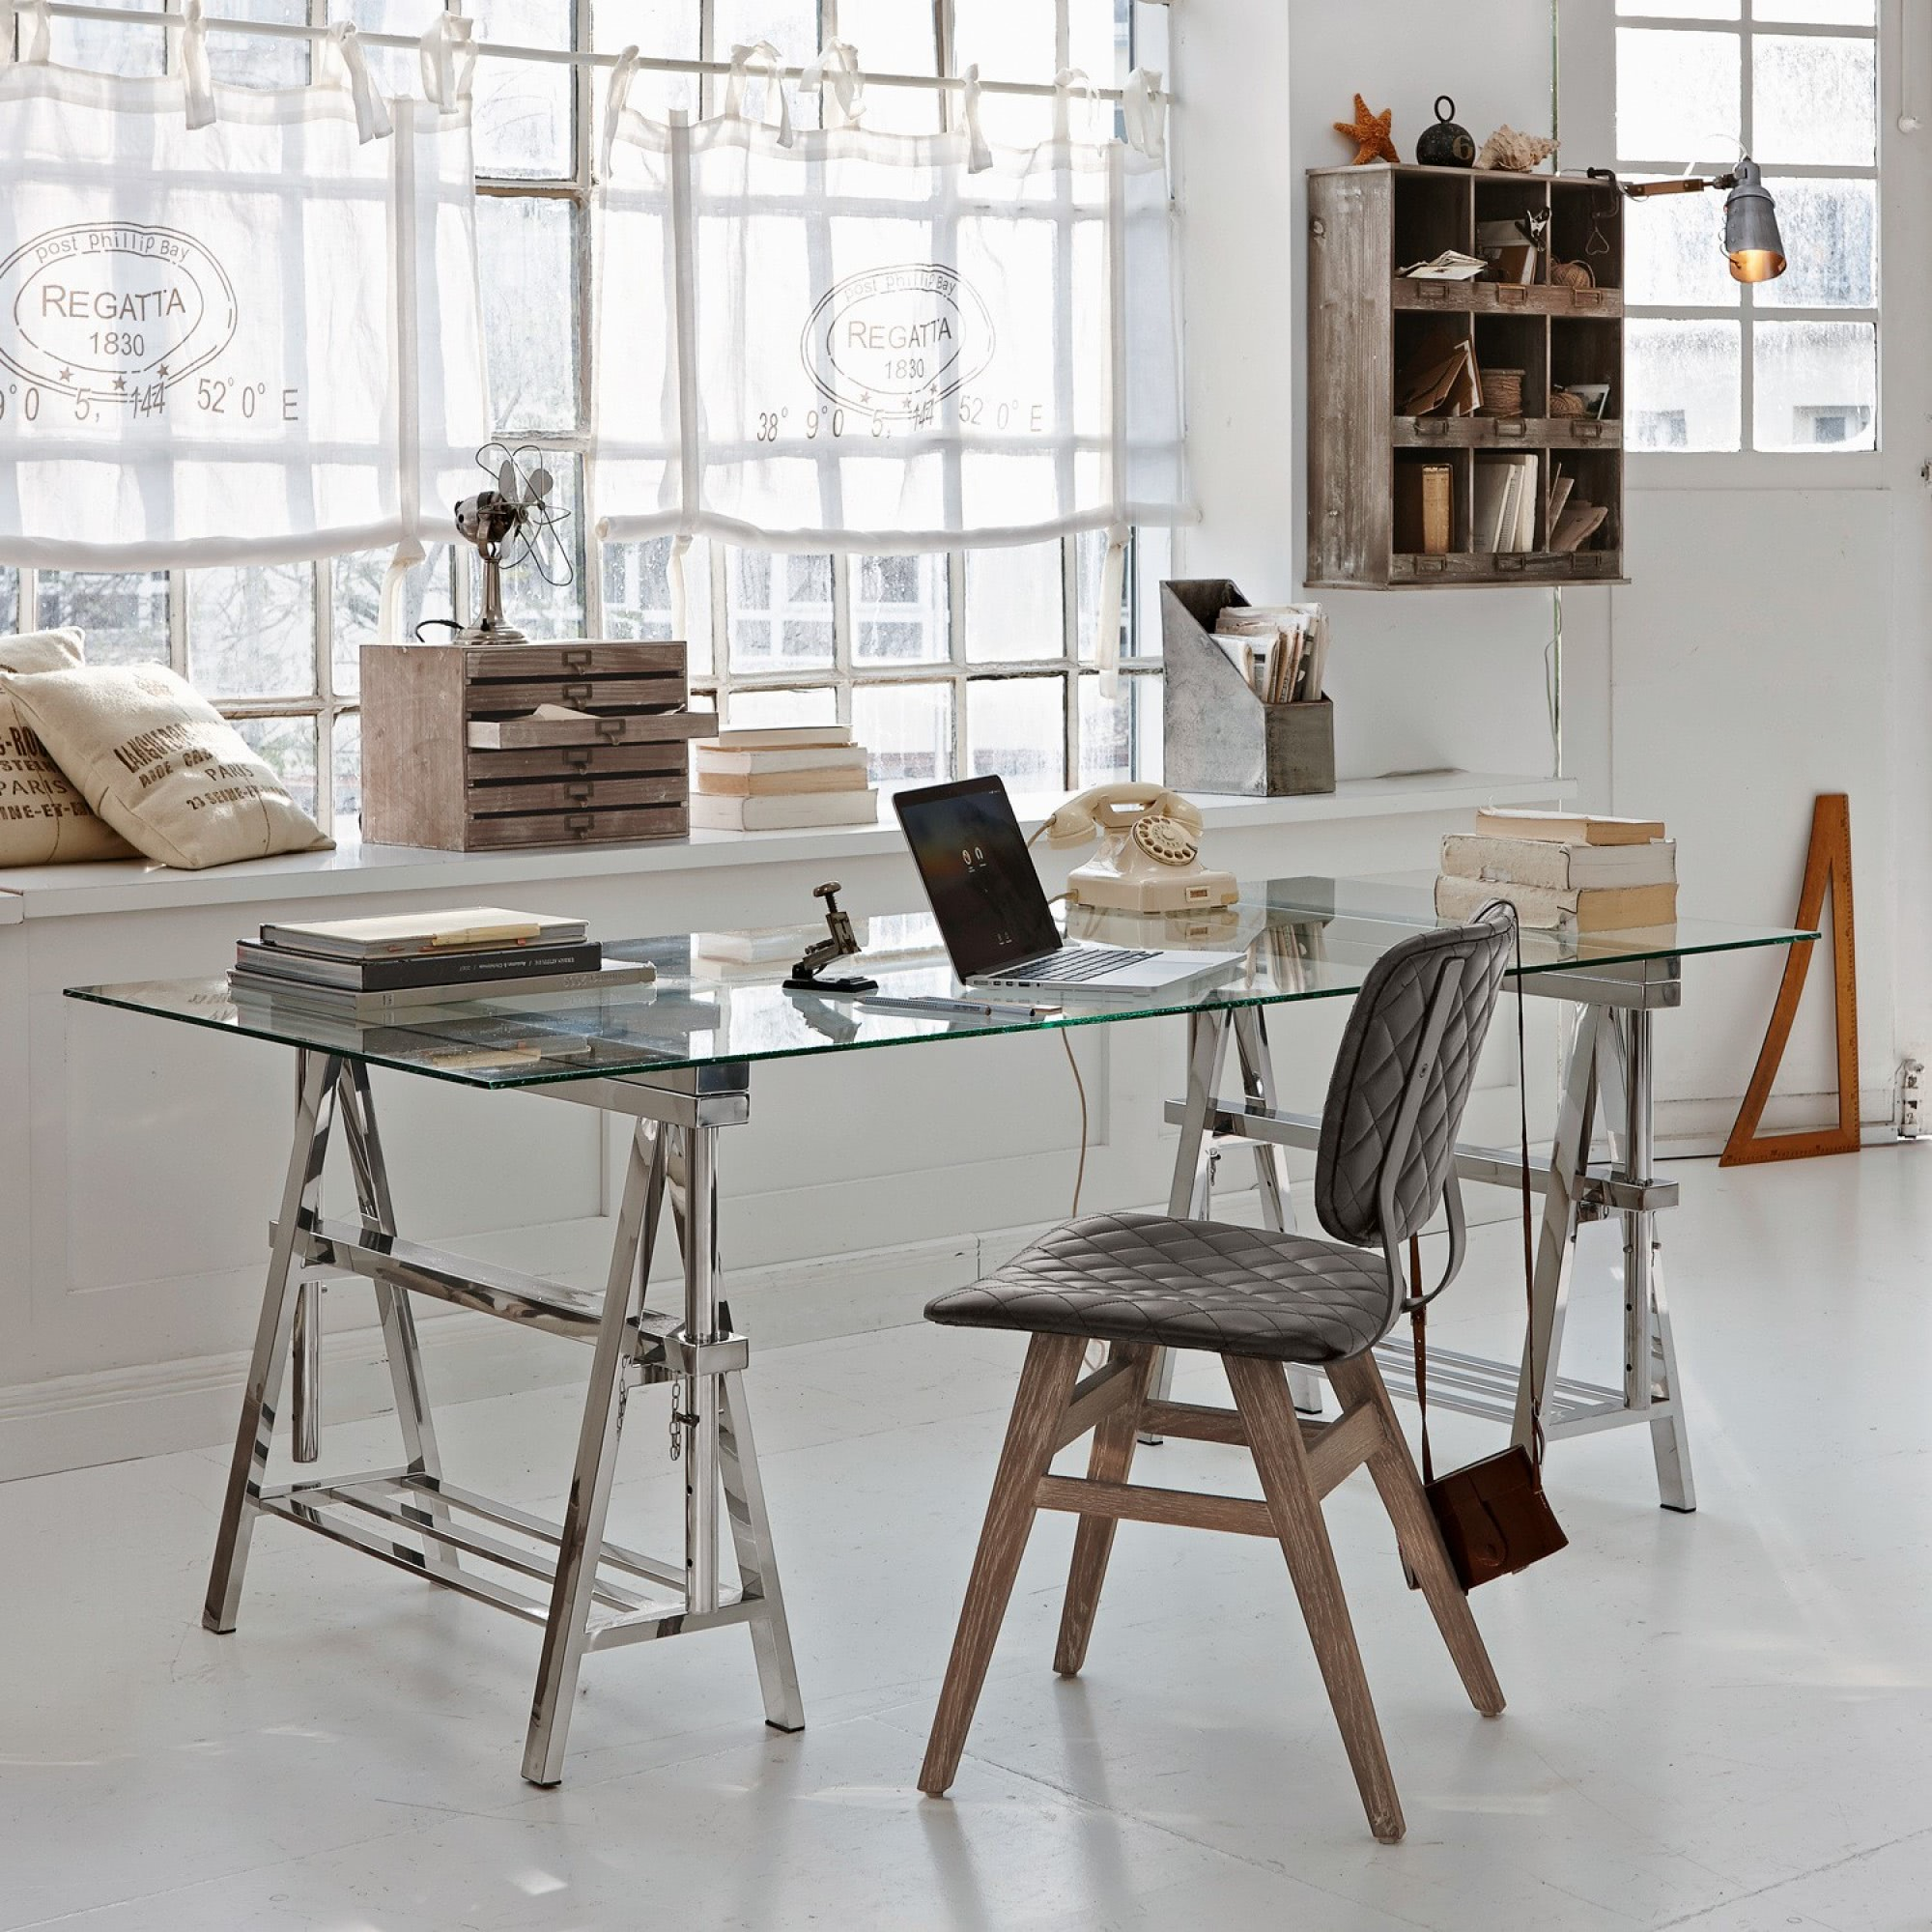 schreibtisch randolph loberon coming home. Black Bedroom Furniture Sets. Home Design Ideas